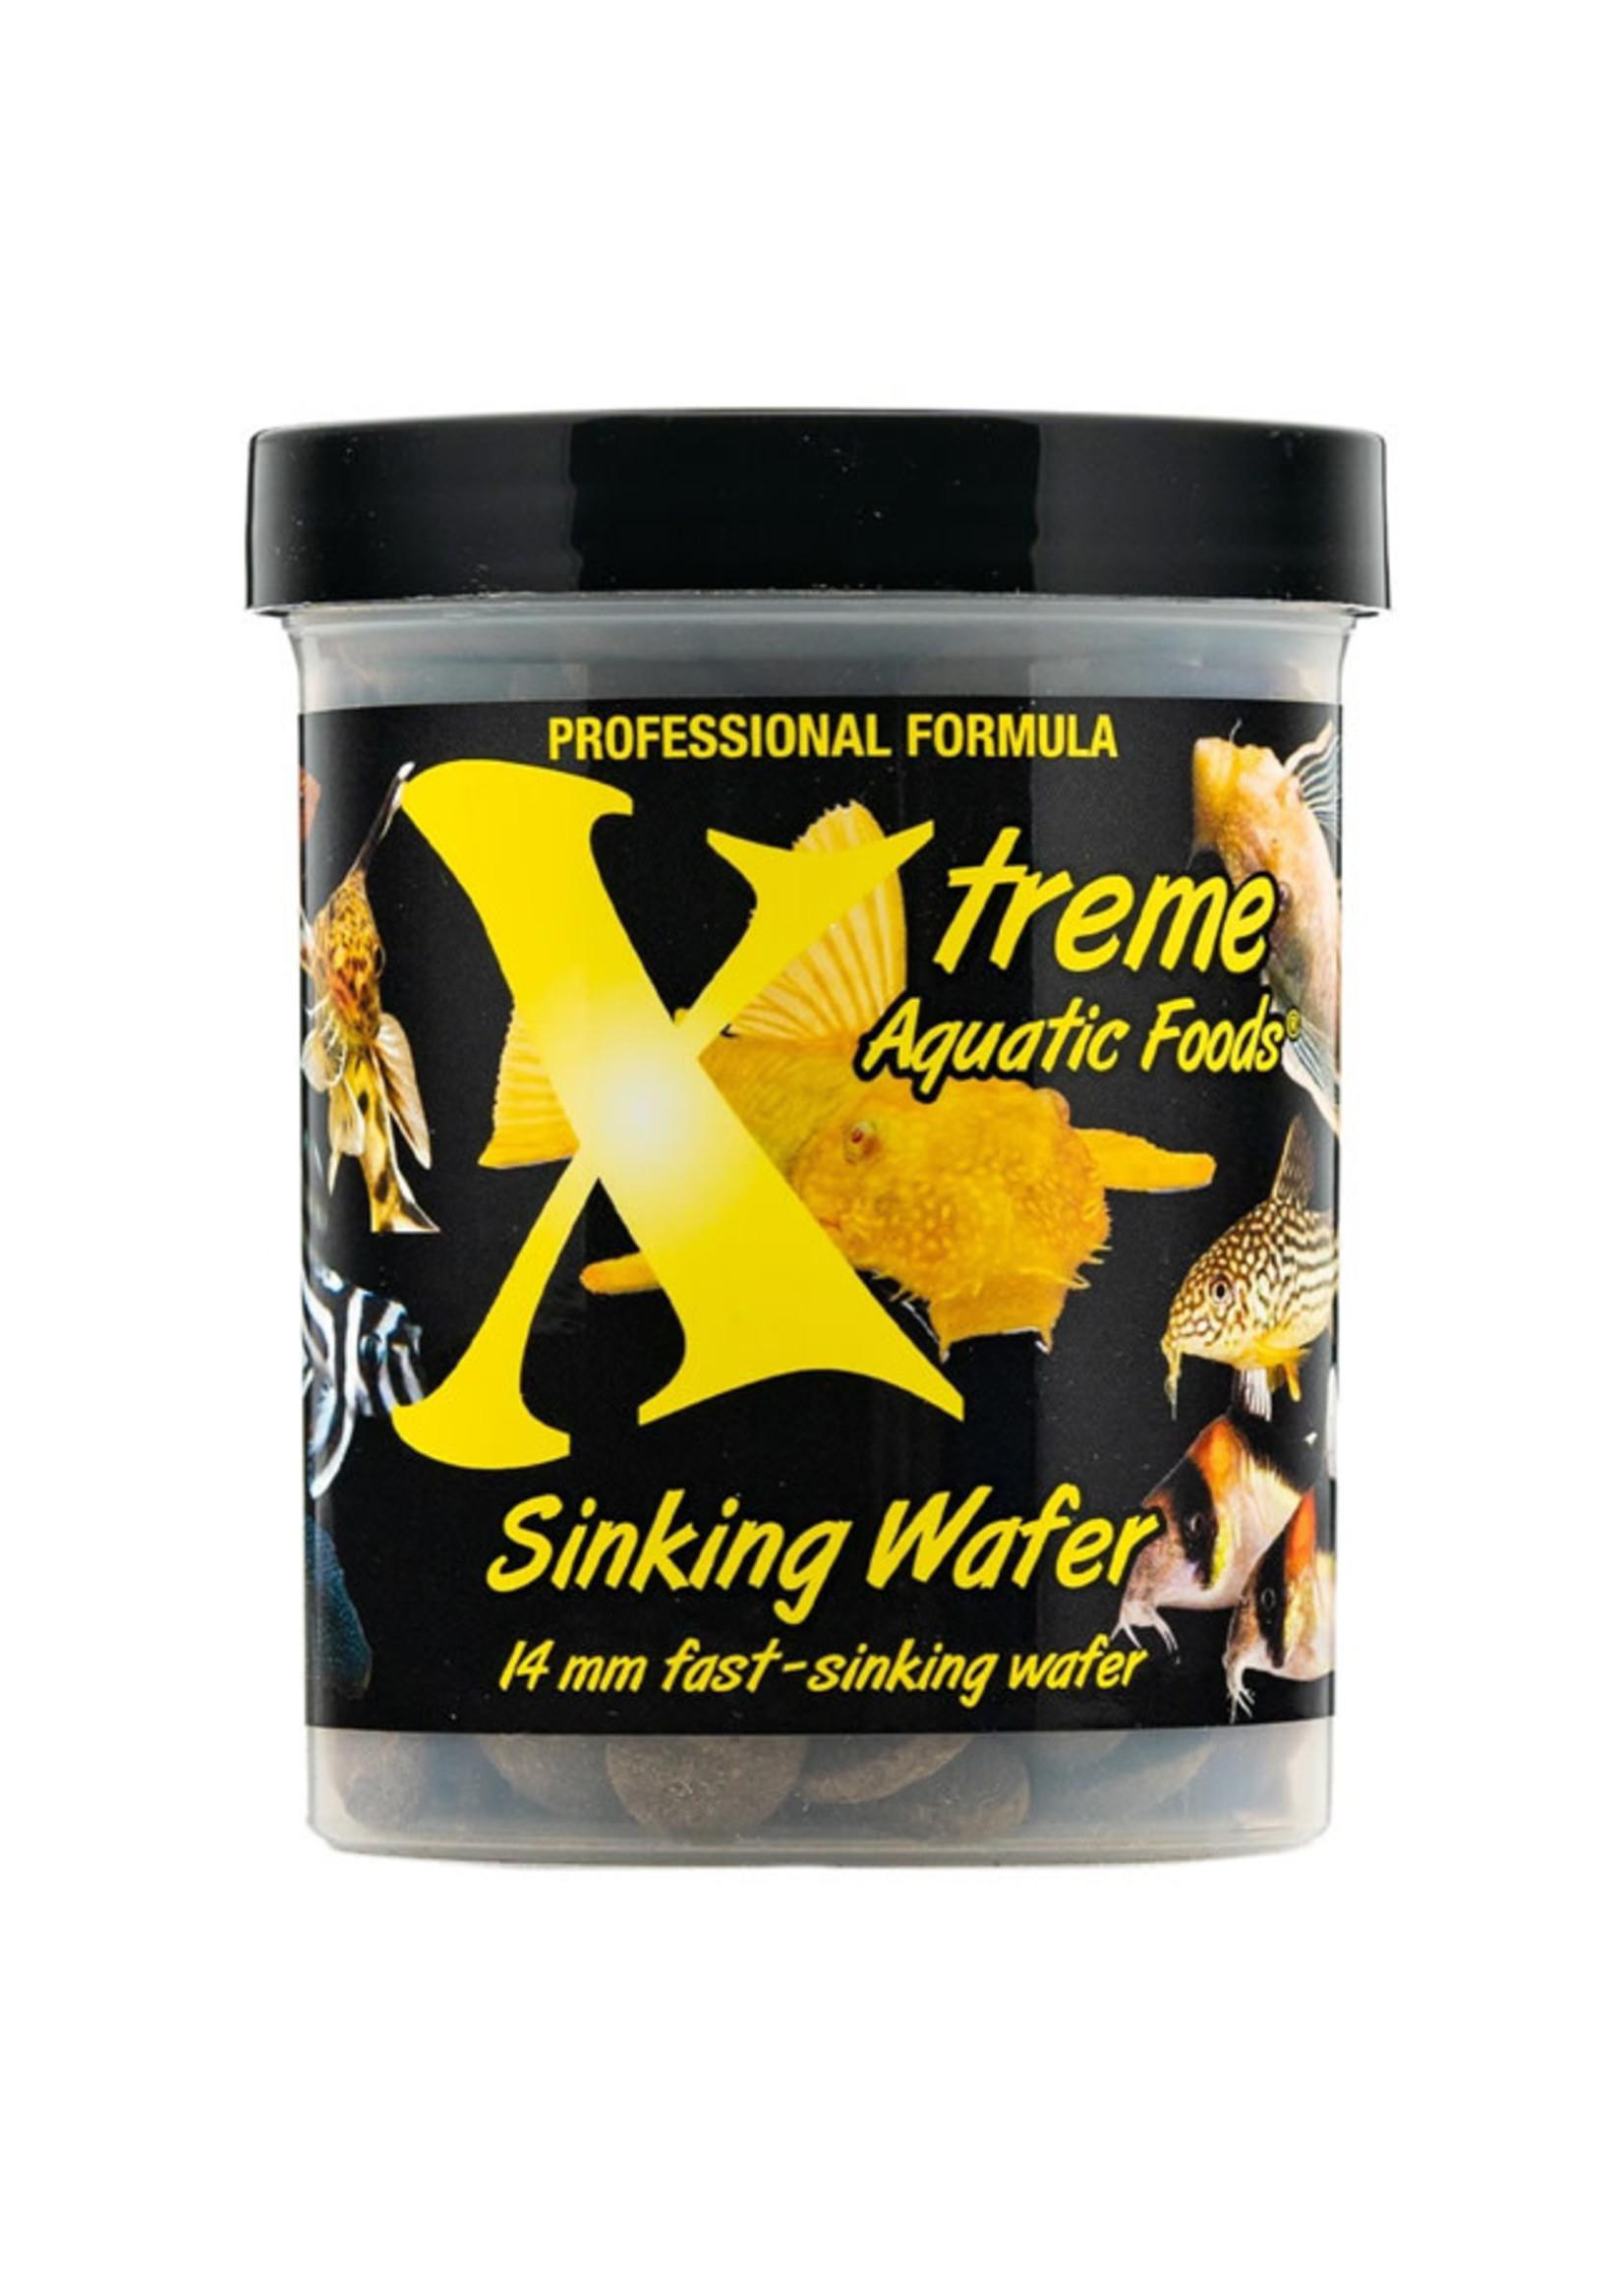 Xtreme Aquatic Foods Xtreme Sinking Wafers